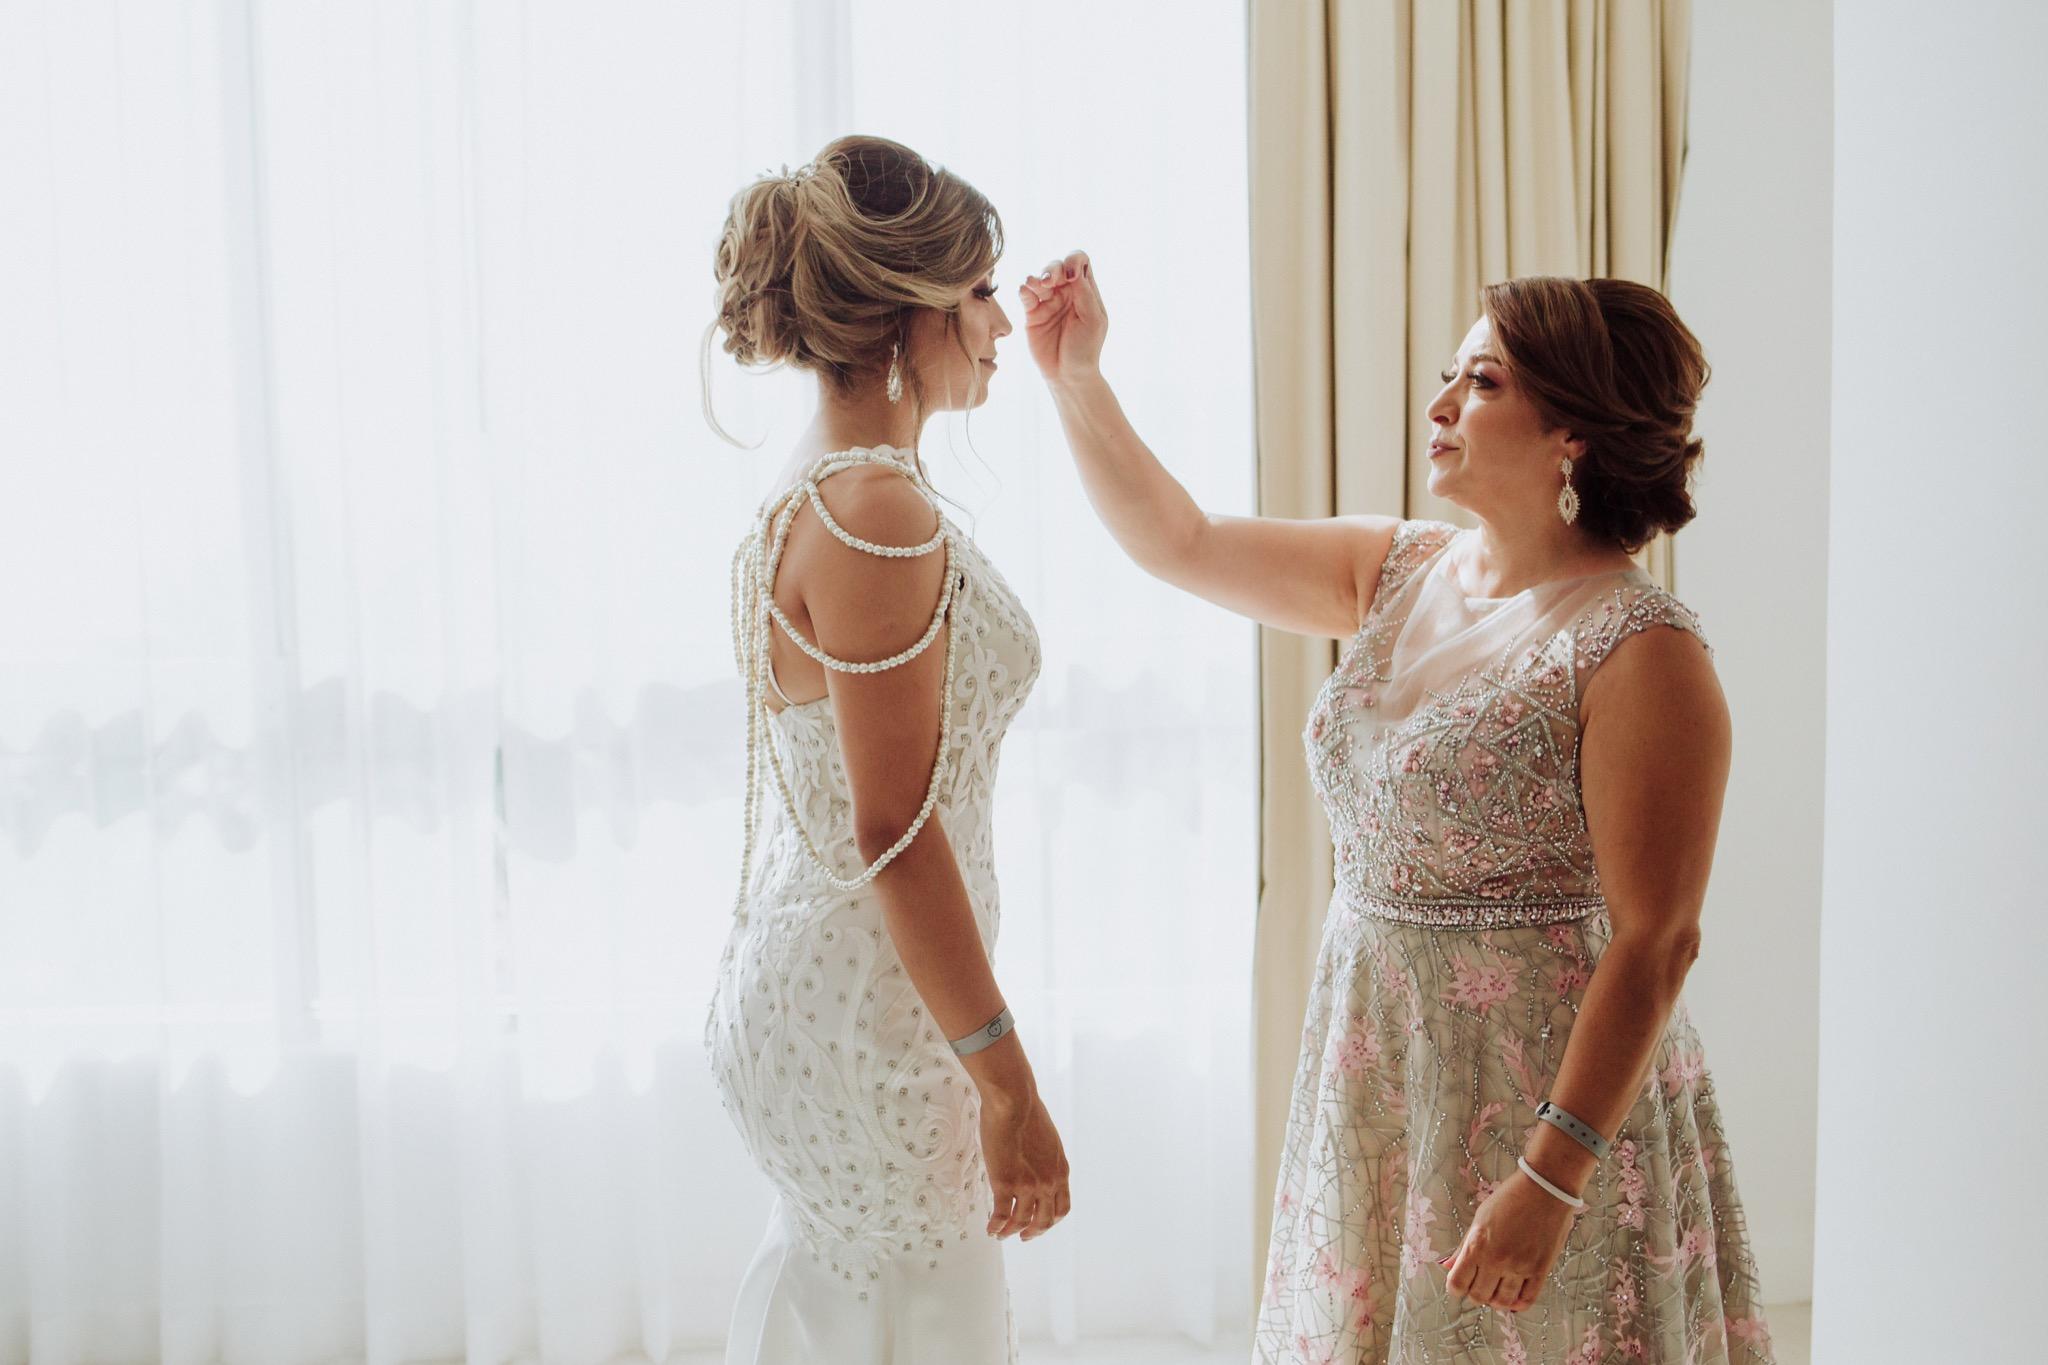 Javier_noriega_fotografo_bodas_profesional_zacatecas_mexico_mazatlan_sinaloa_photographer_weddings13